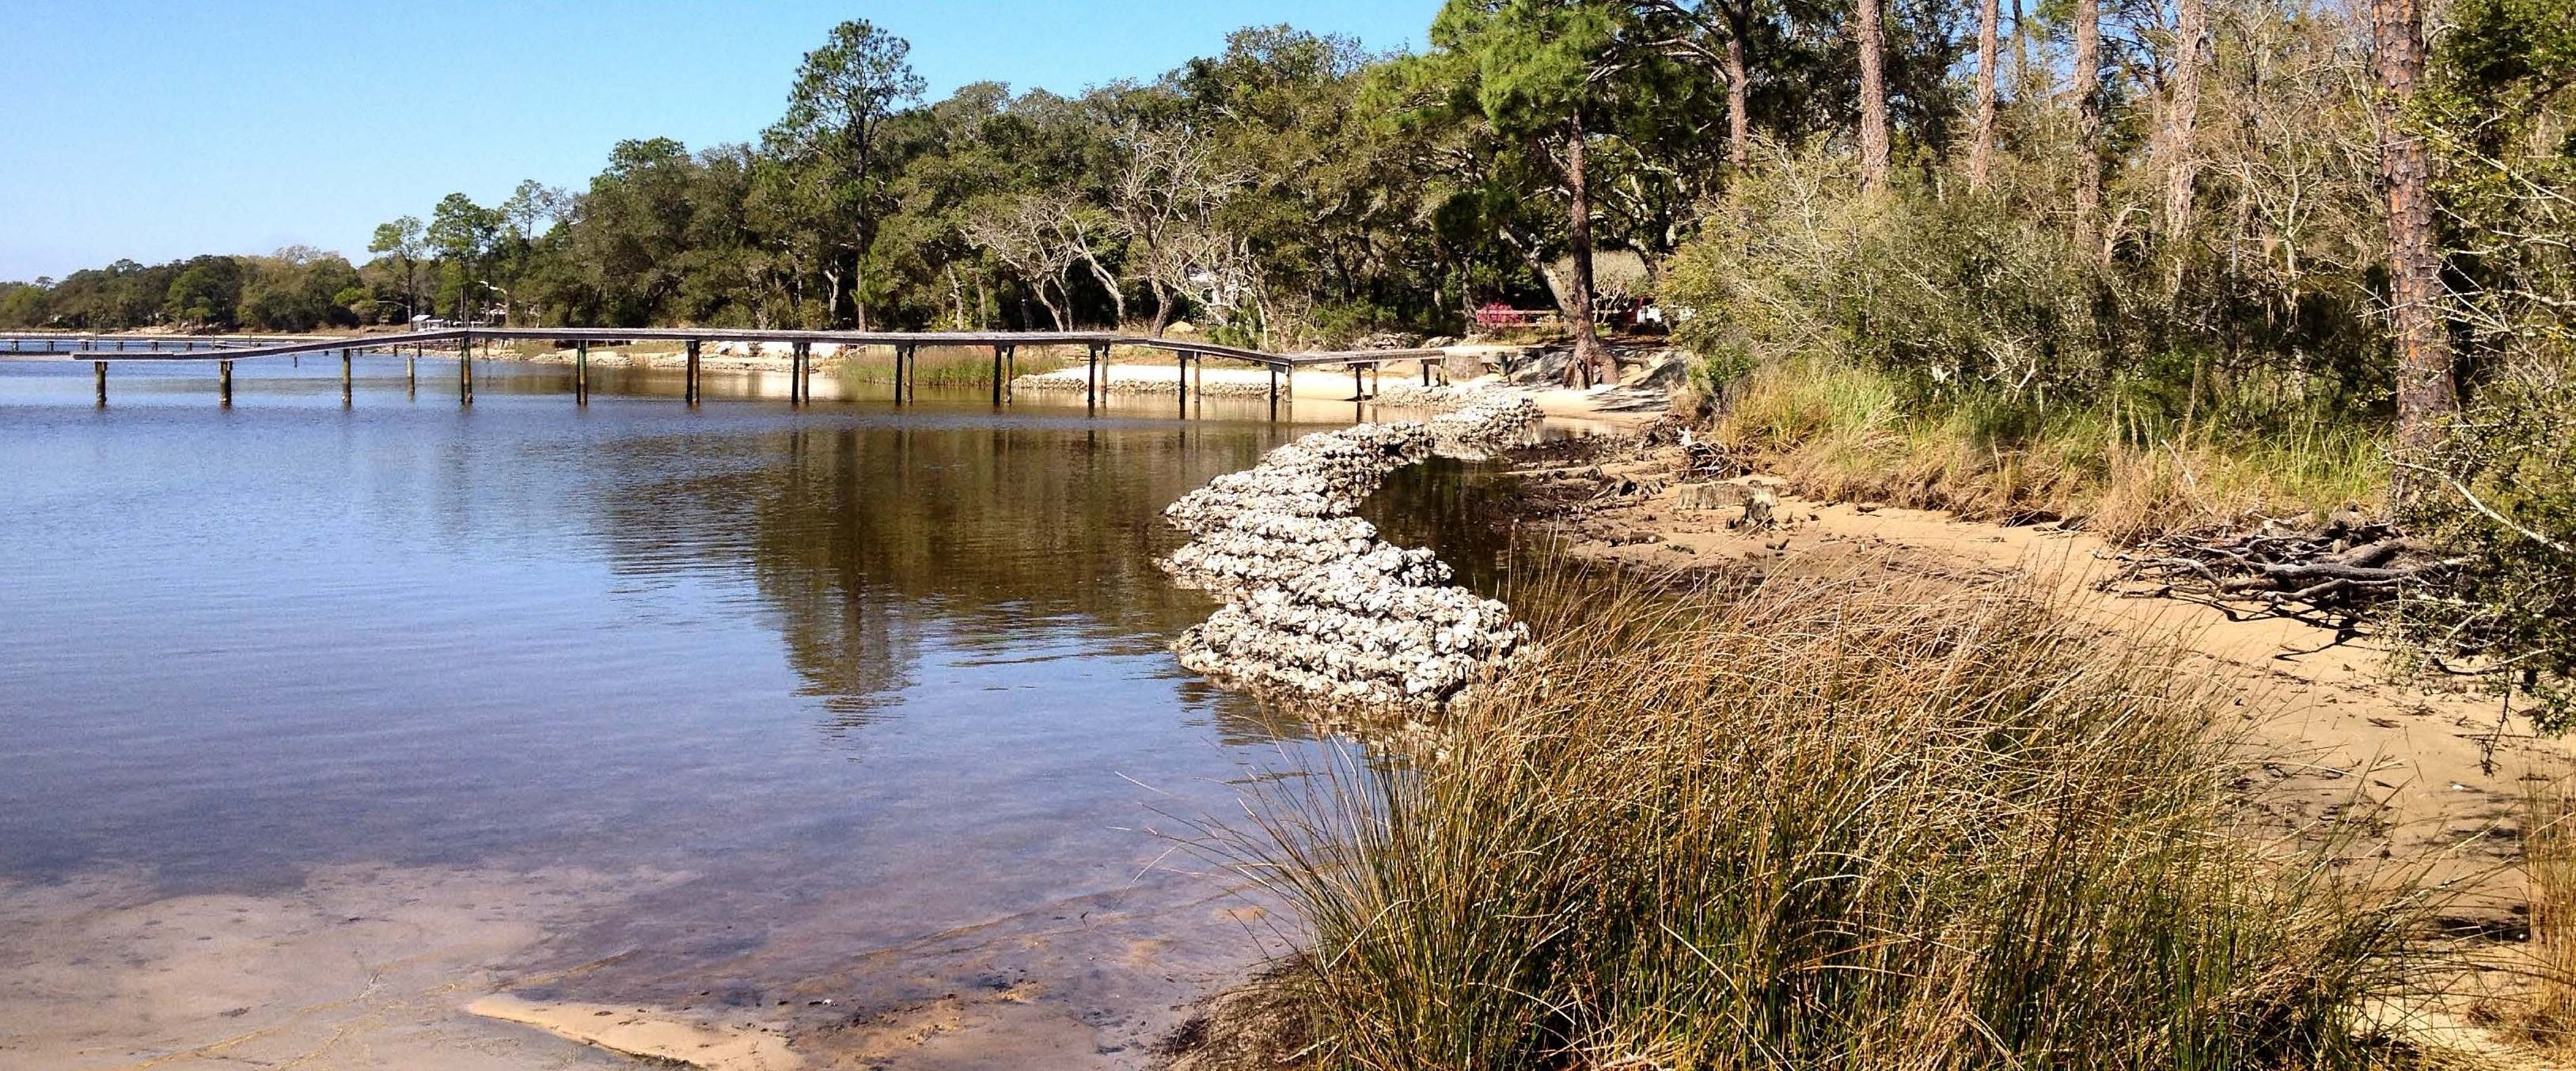 Bayou Grande Living Shoreline Project